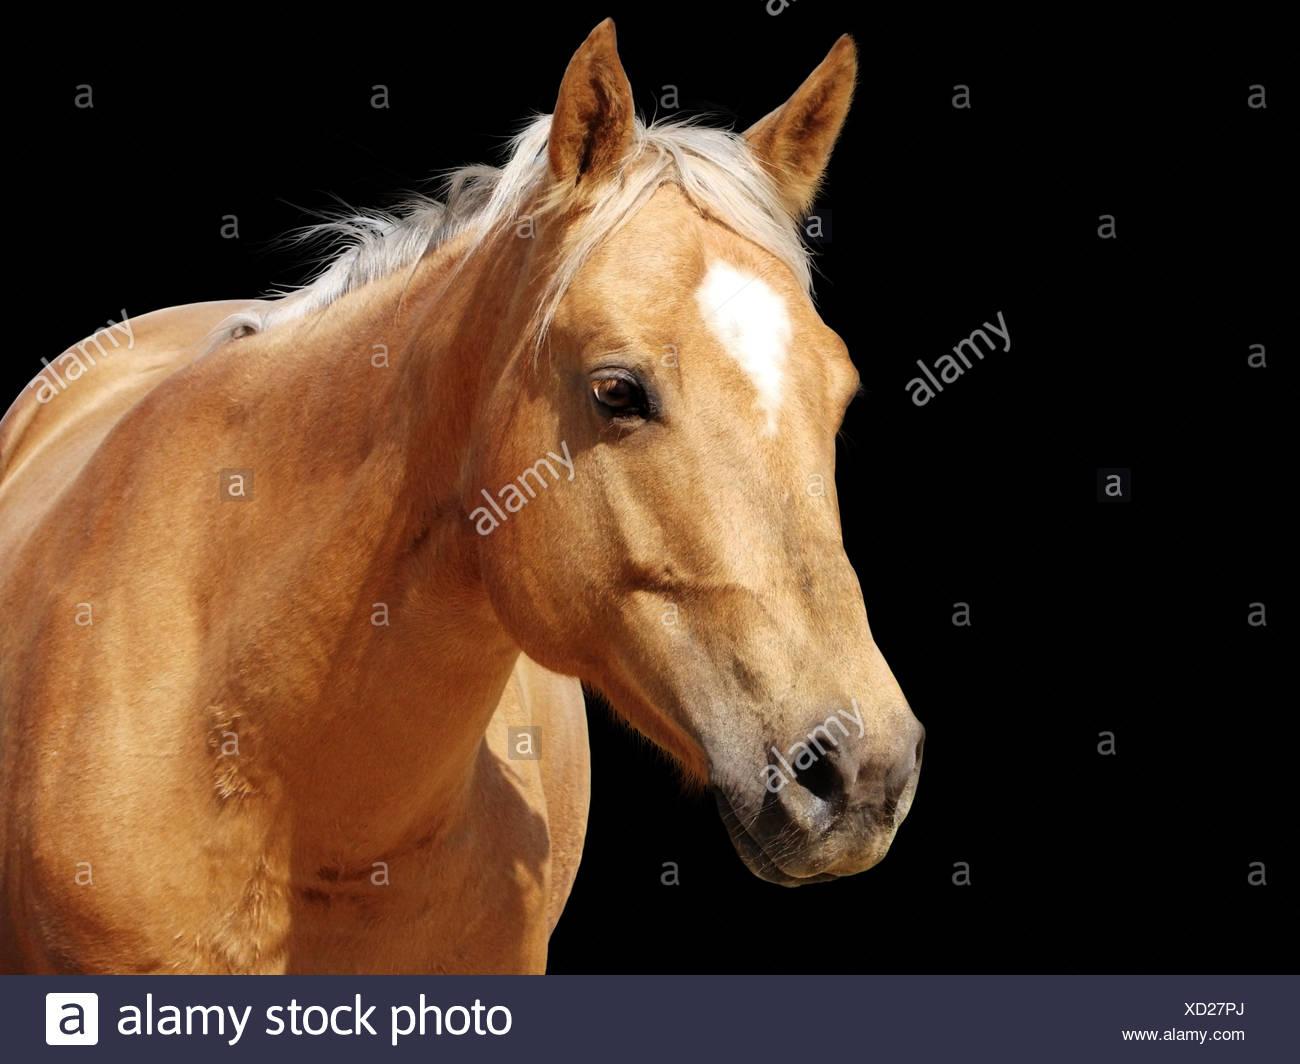 Close Up Golden Palomino Horse Stock Photo Alamy